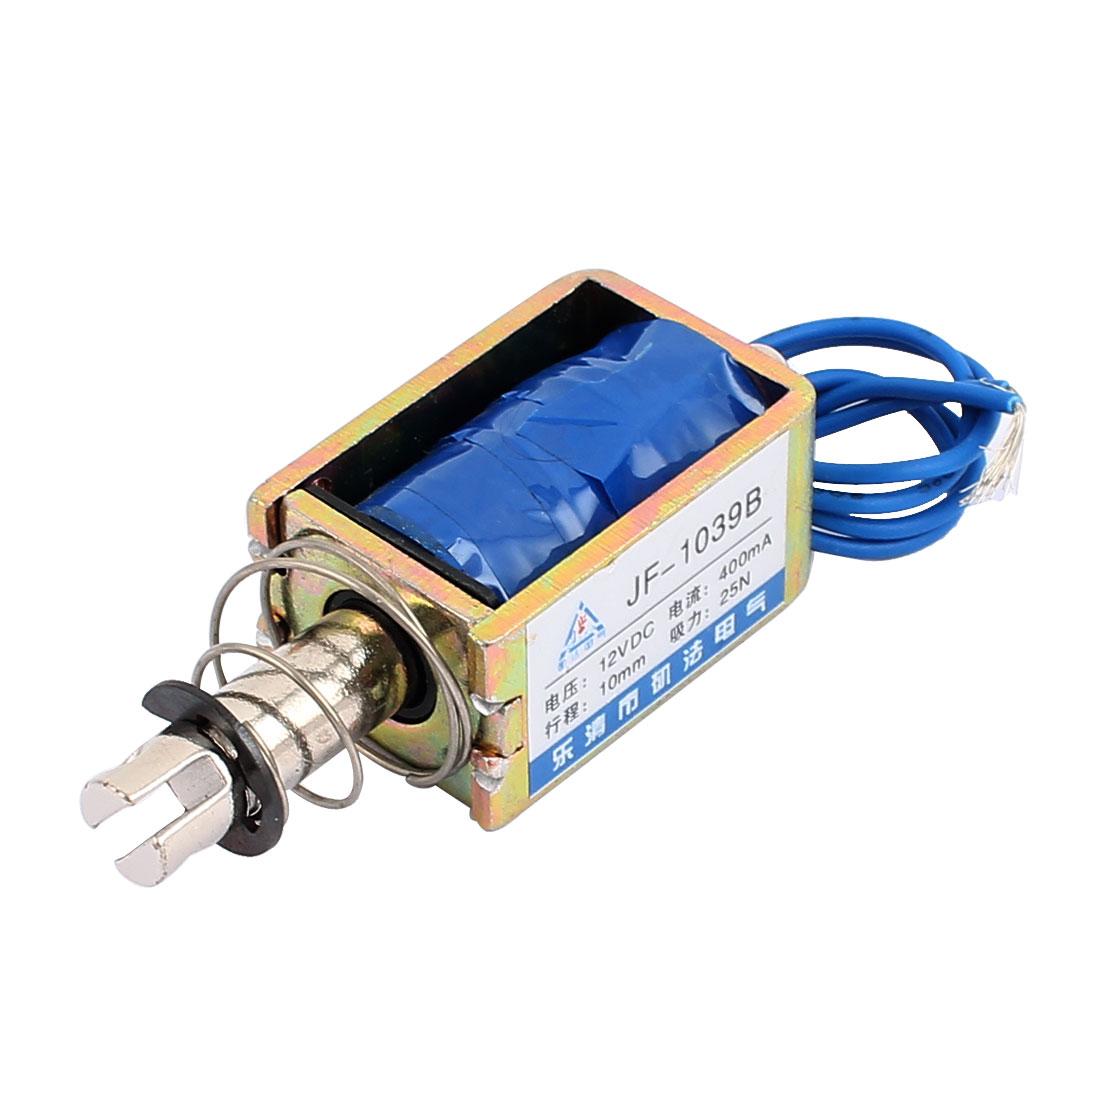 JF-1039B DC12V 400mA 10mm 25N Push Pull Type DIY DC Solenoid Electromagnet Magnet